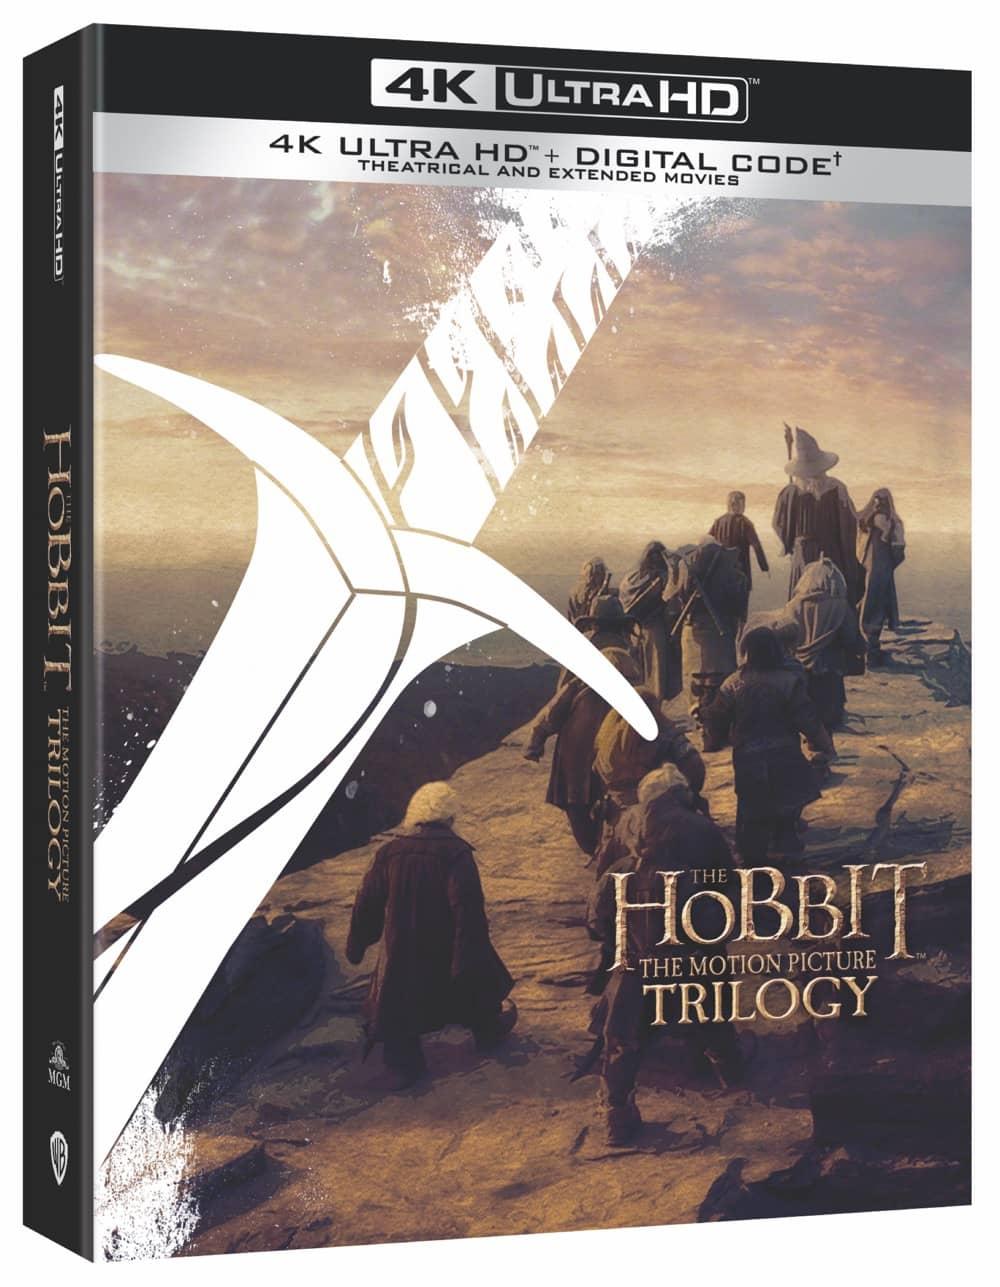 HOBBIT TRILOGY 1000756530 4K SC 3D FINAL WW SKEW1